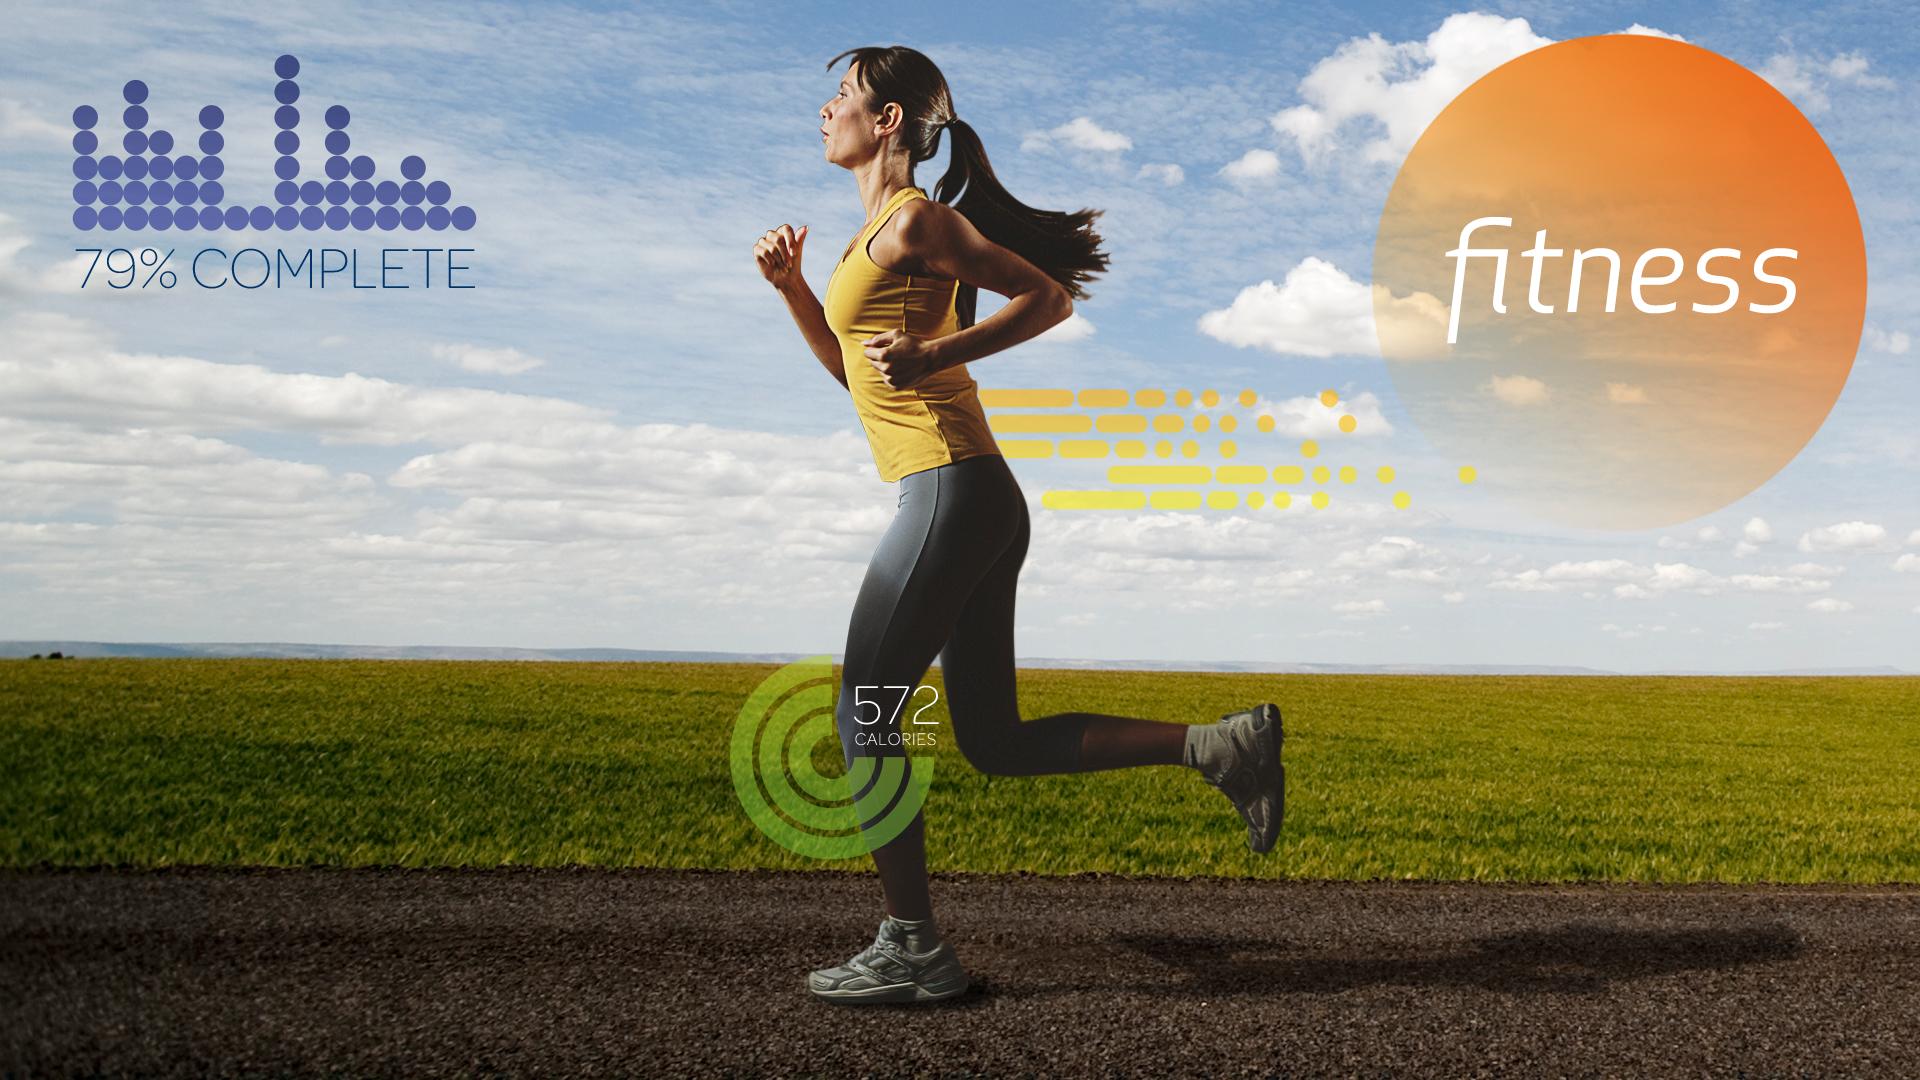 att_lifestyle_fitness4.jpg